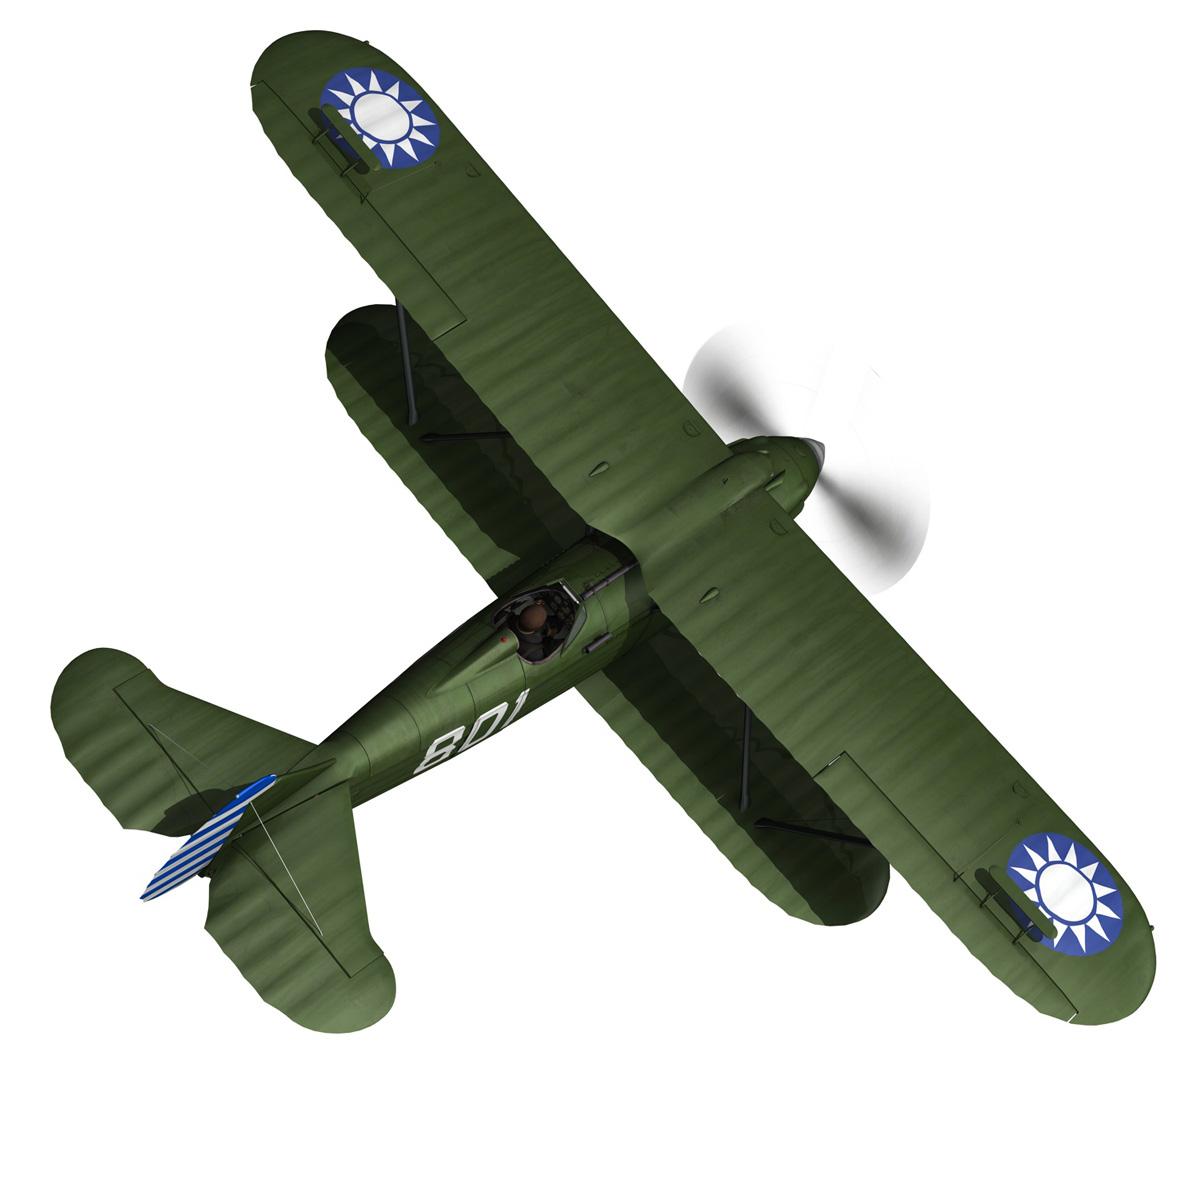 fiat cr.32 – chinese nationalist air force 3d model fbx c4d lwo obj 272629